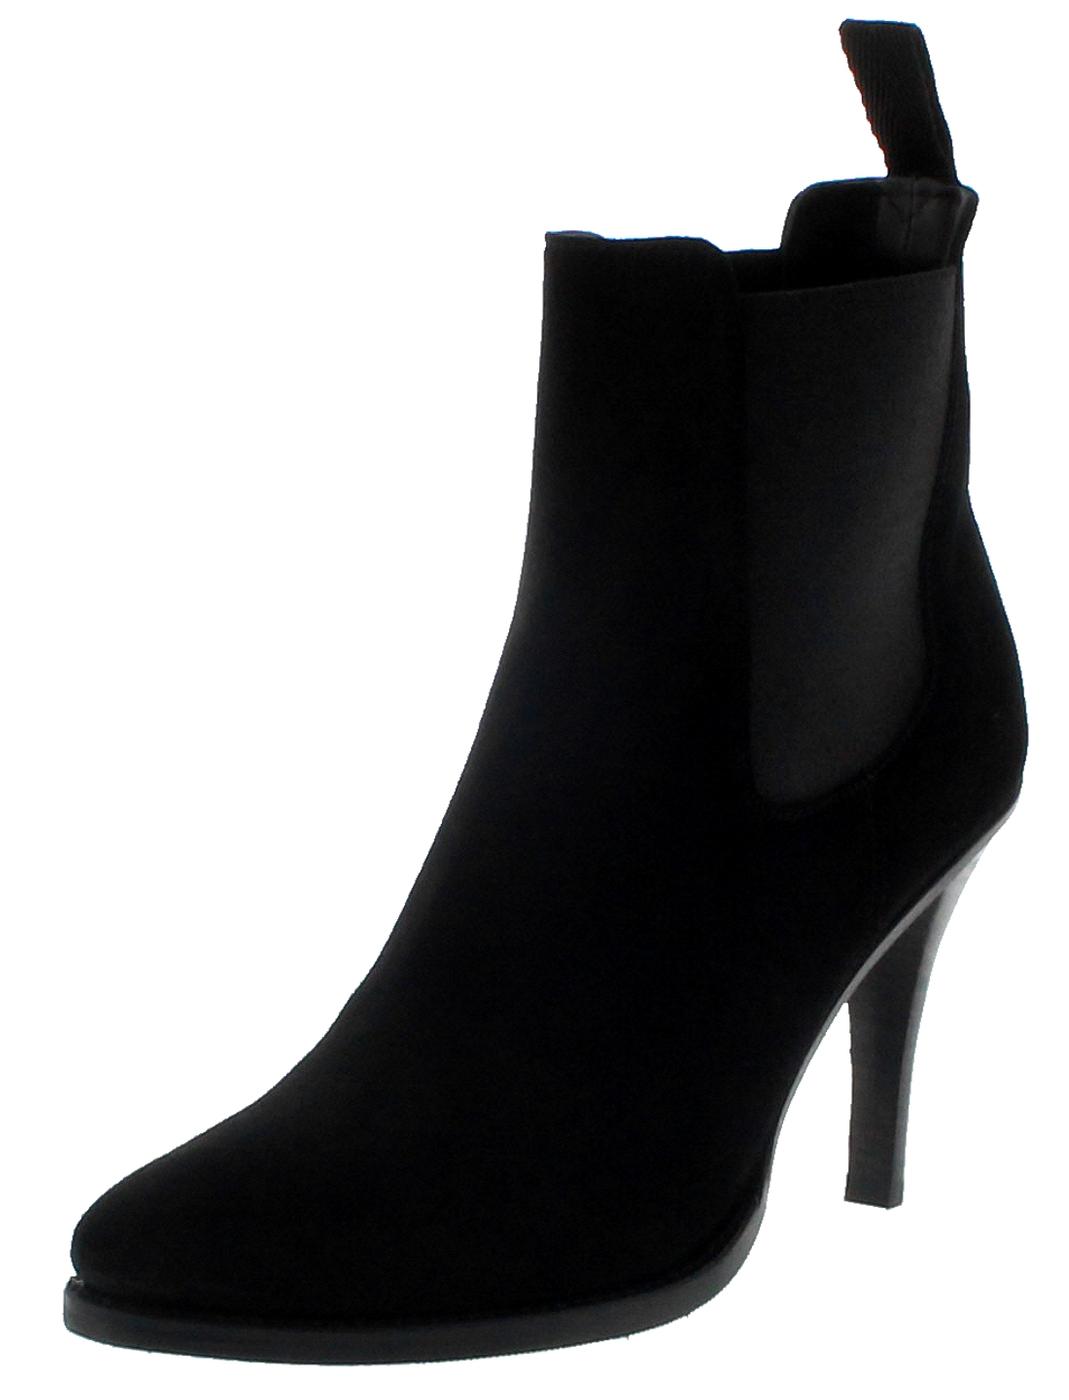 FB Fashion Boots EVA II Negro ladies ankle boot - black